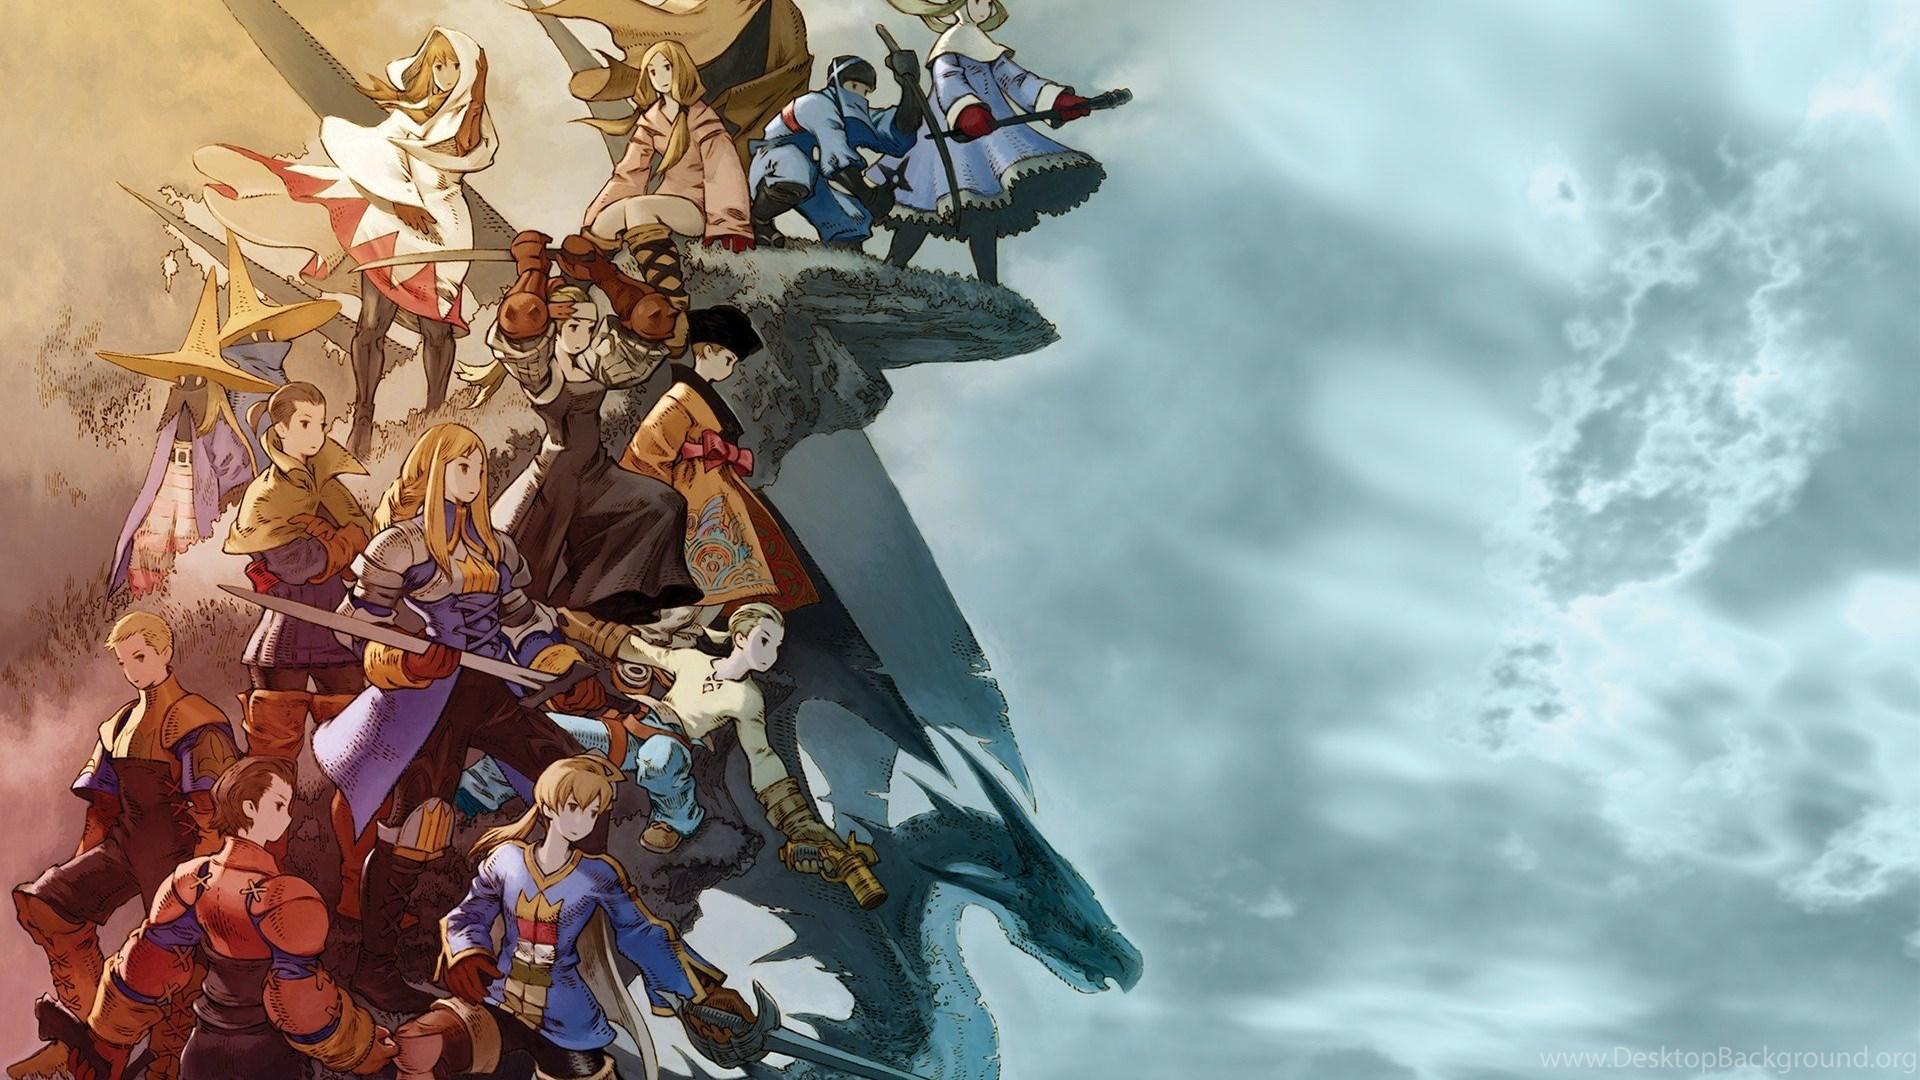 Hd Final Fantasy Tactics Wallpapers Desktop Background